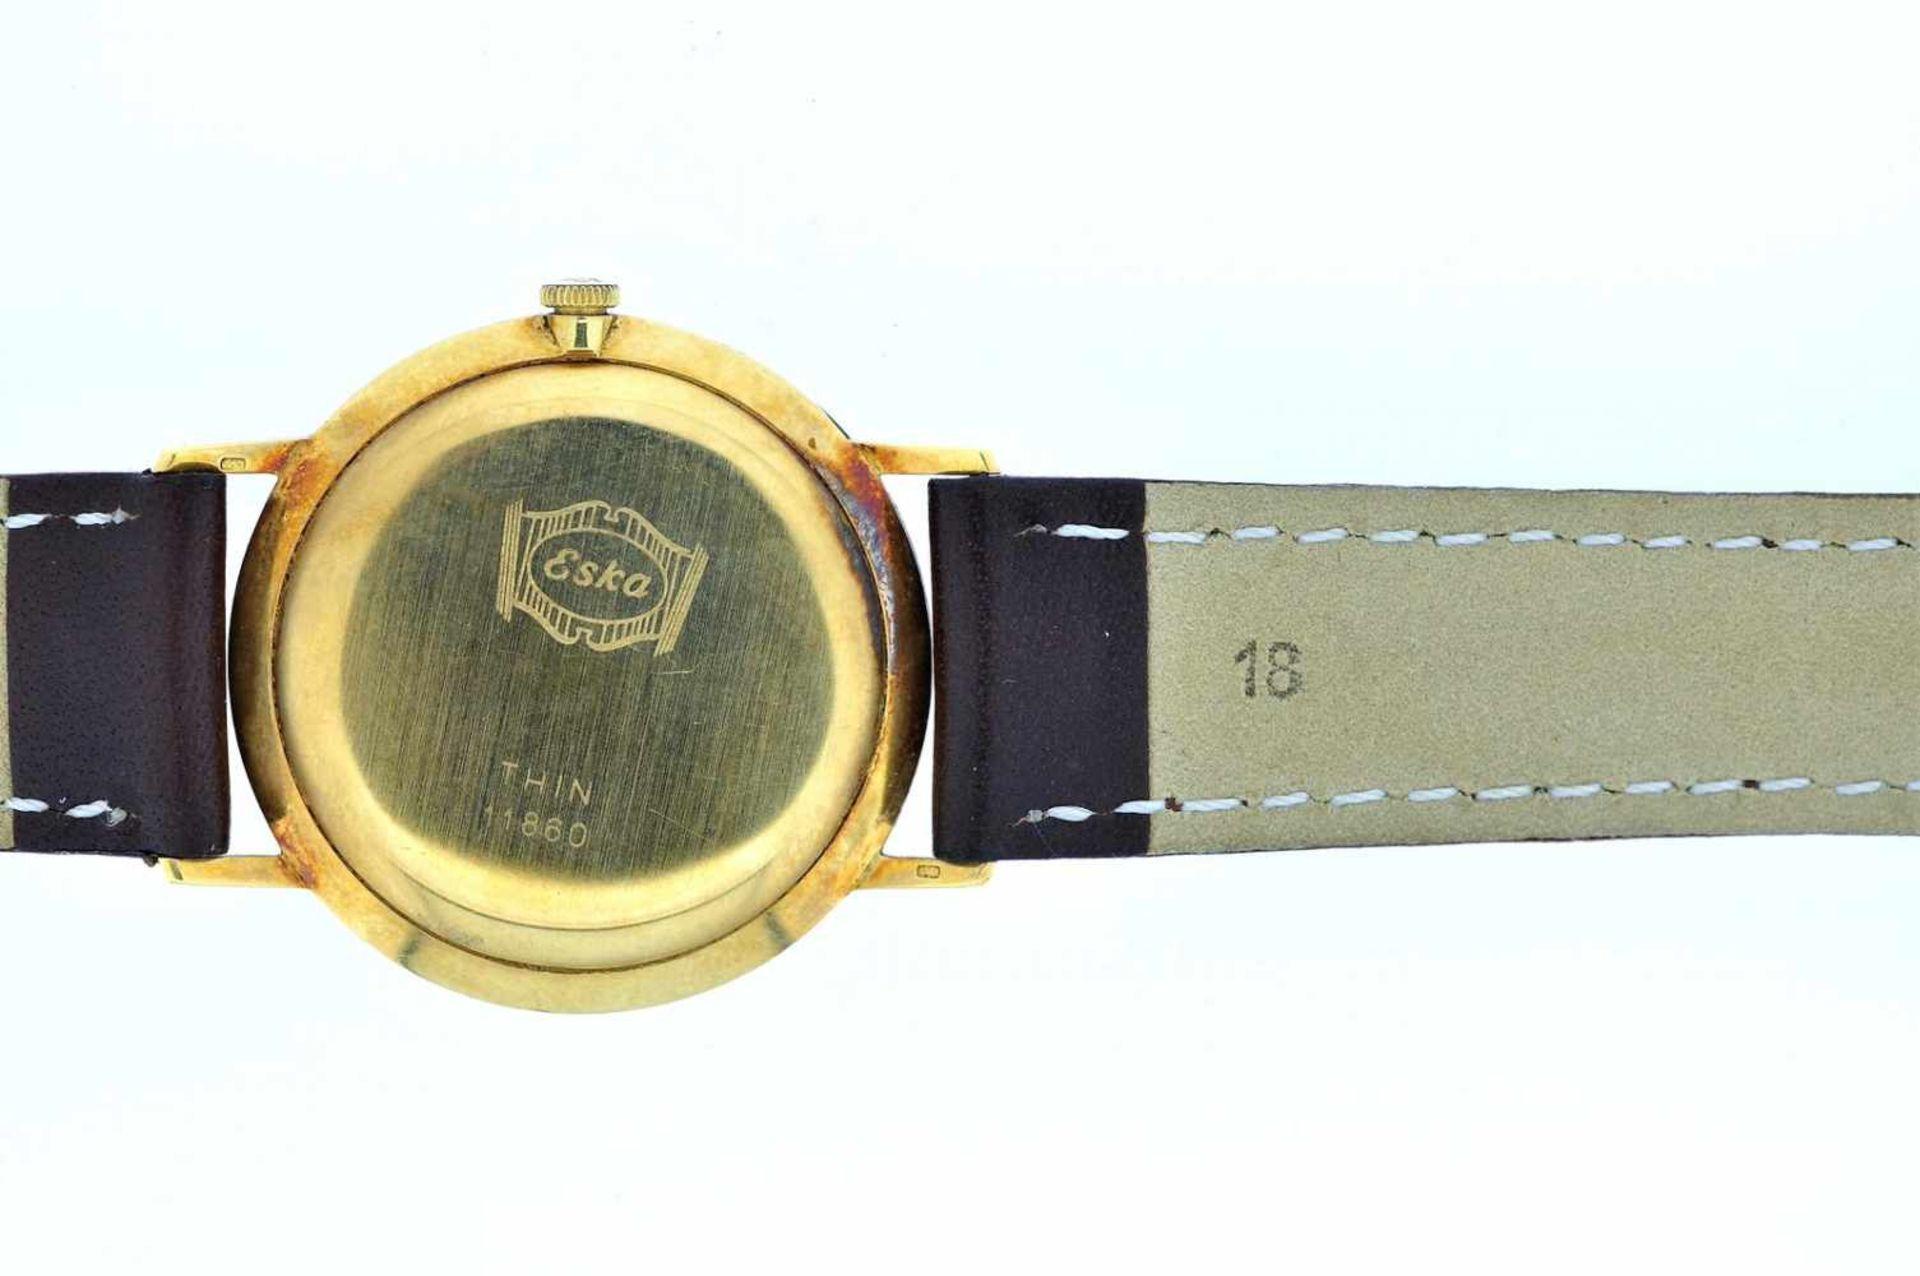 Eska Goldene Armbanduhr an Lederband, Eska, Handaufzug, Ankerwerk, Werkservice empfohlen, 28,1 g. - Bild 5 aus 6